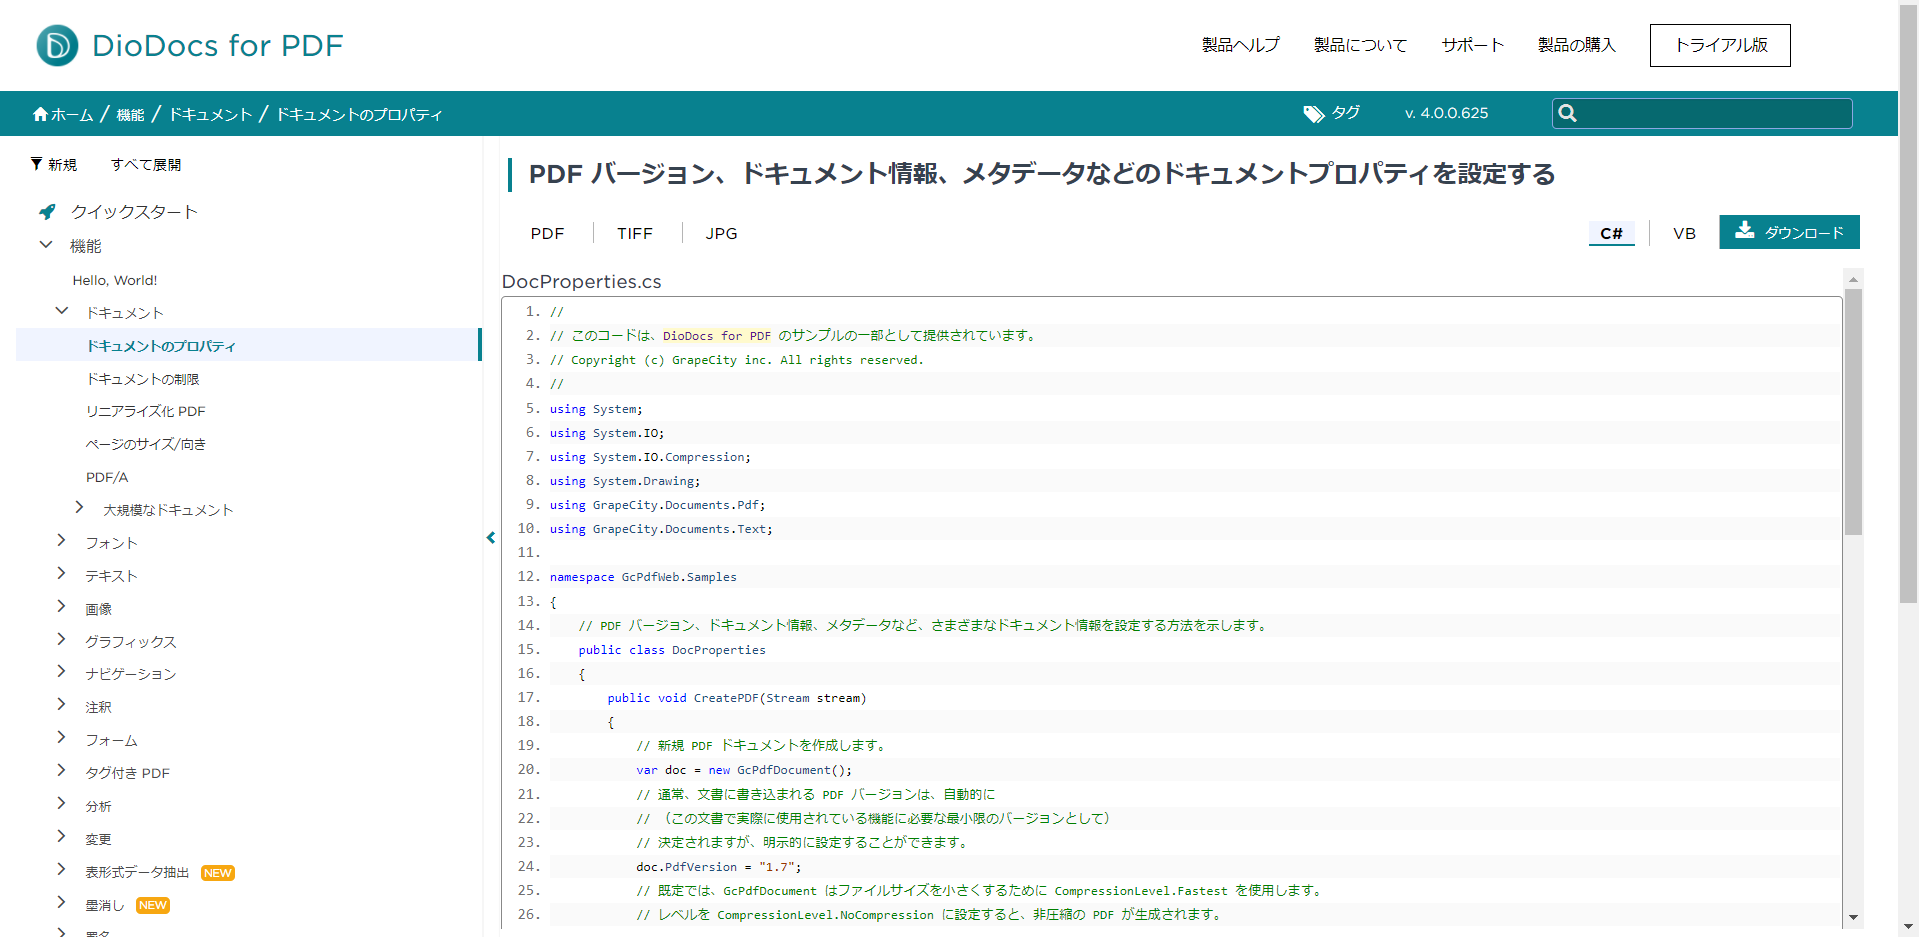 DioDocs for PDF